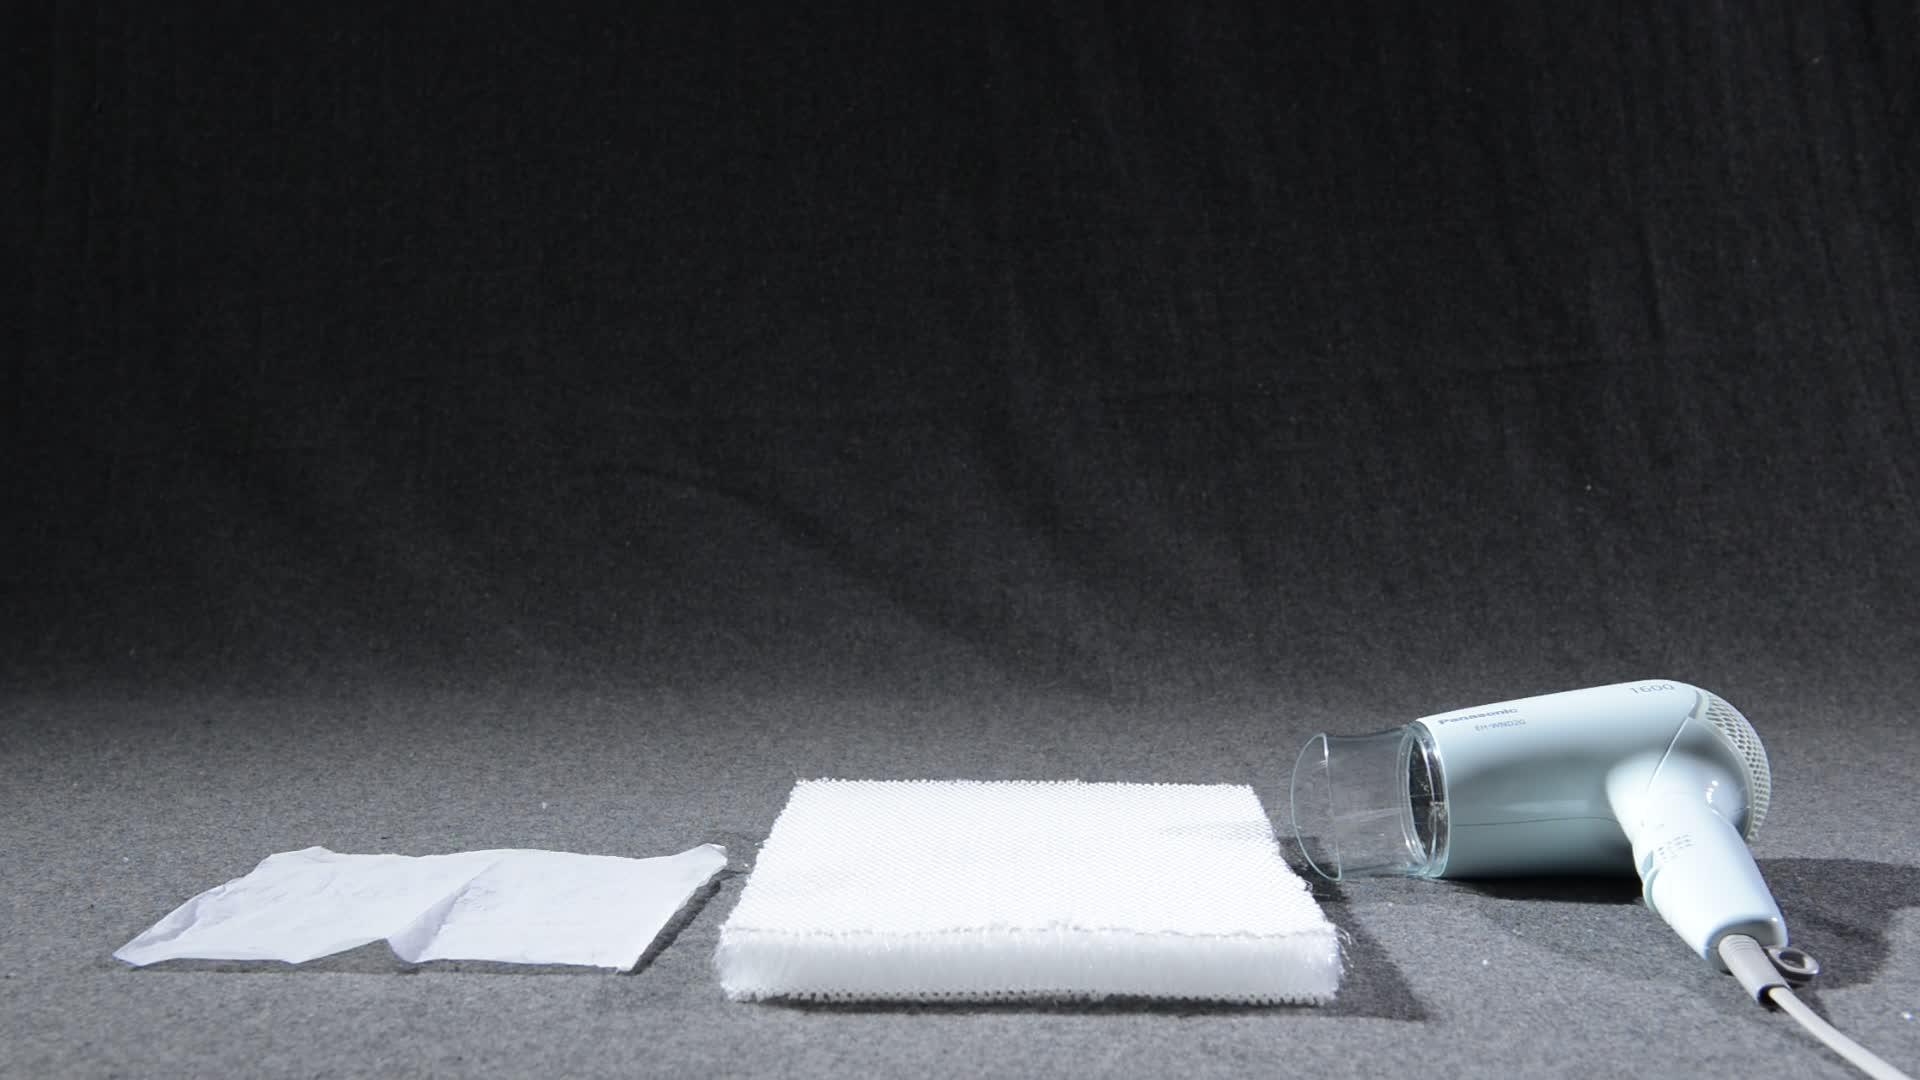 SGS 認証 3D ポリエステルメッシュ生地製造カスタムスターパターン通気性抗形状整形ベビークレードル枕